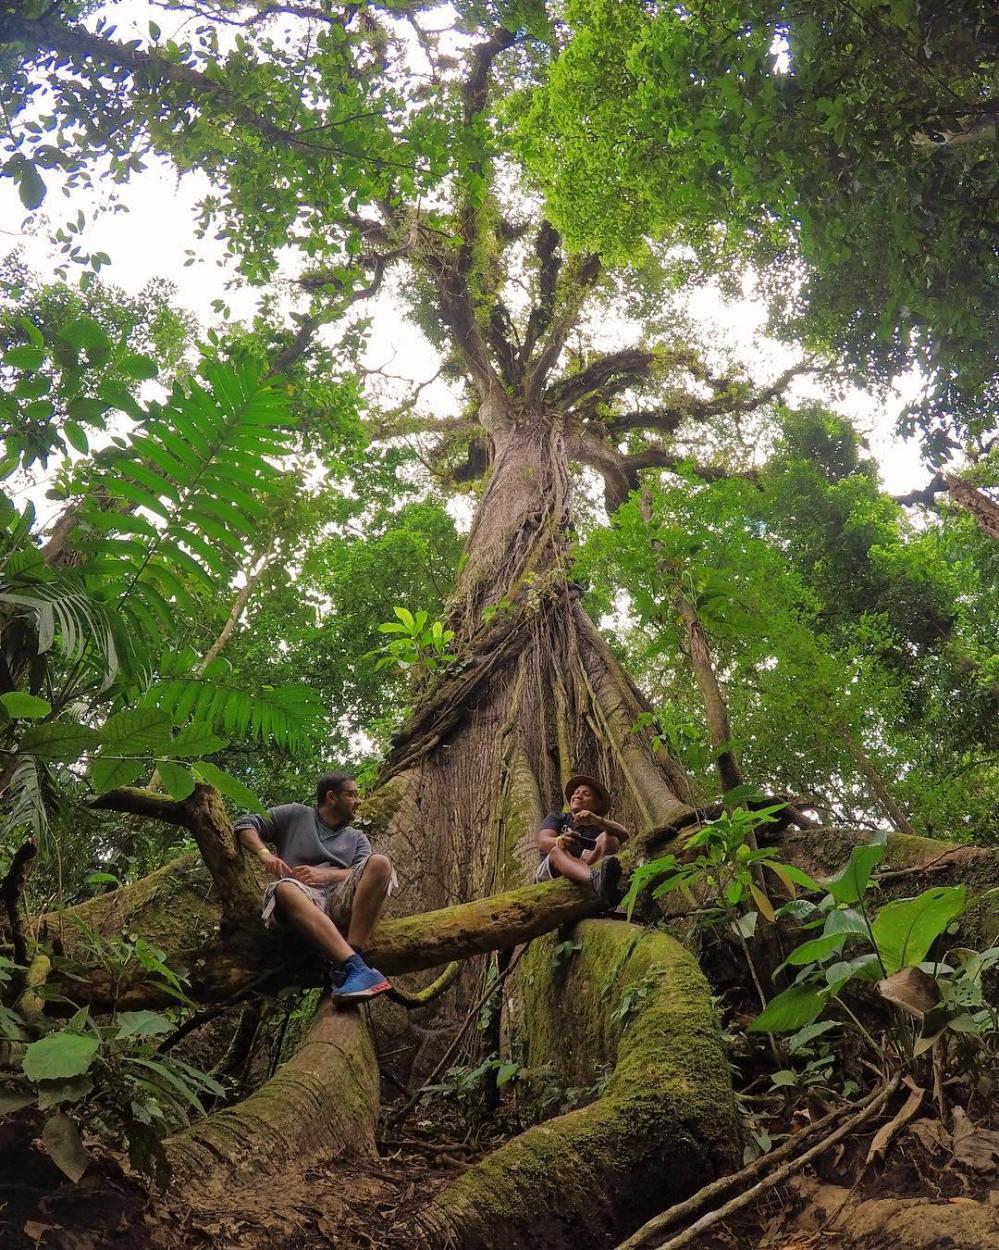 PptoTravel - GoPro - Costa Rica